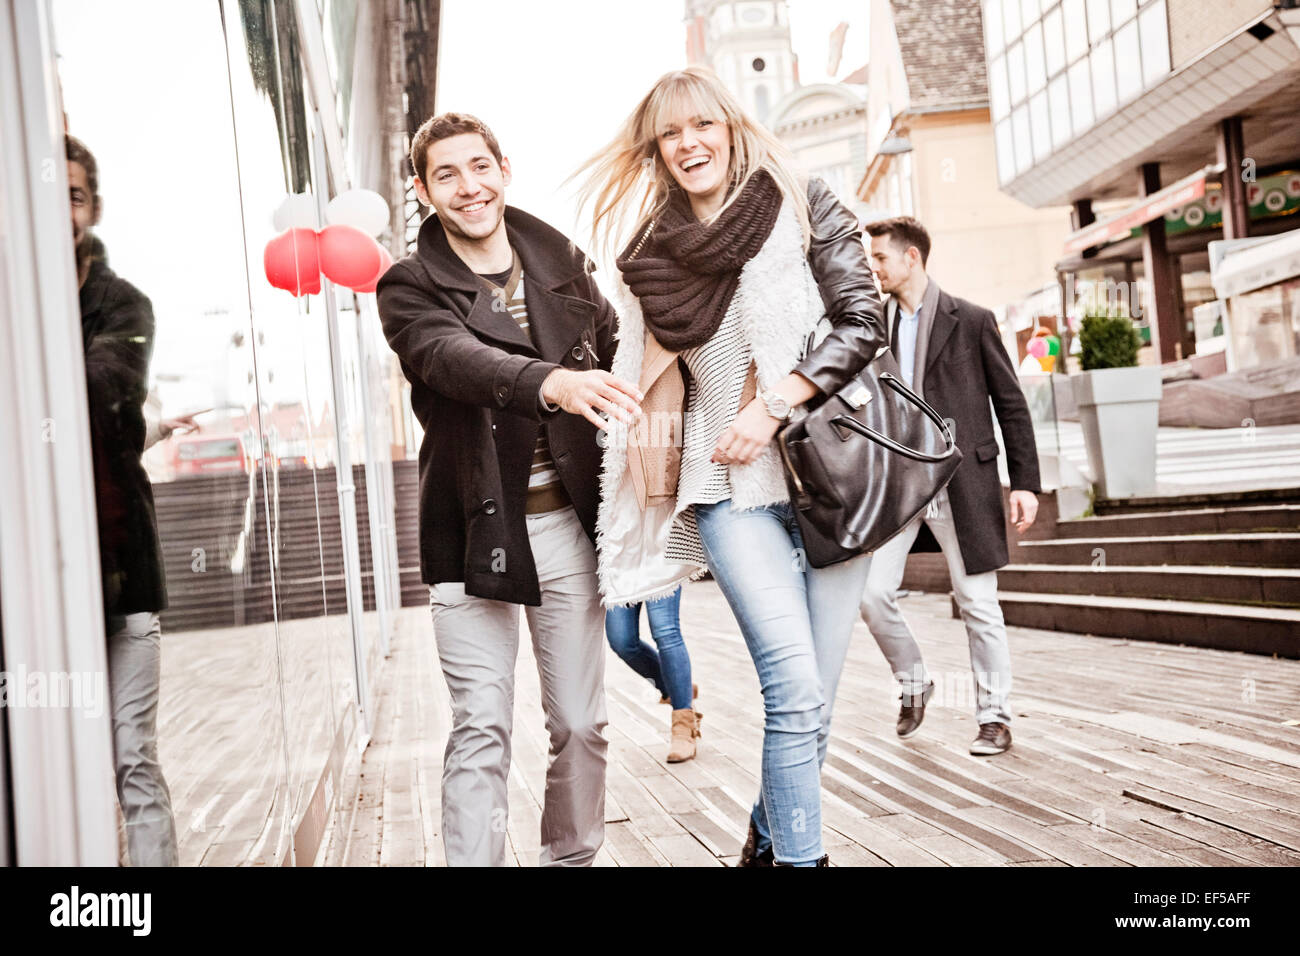 Grupo de Amigos divirtiéndose en compras Imagen De Stock